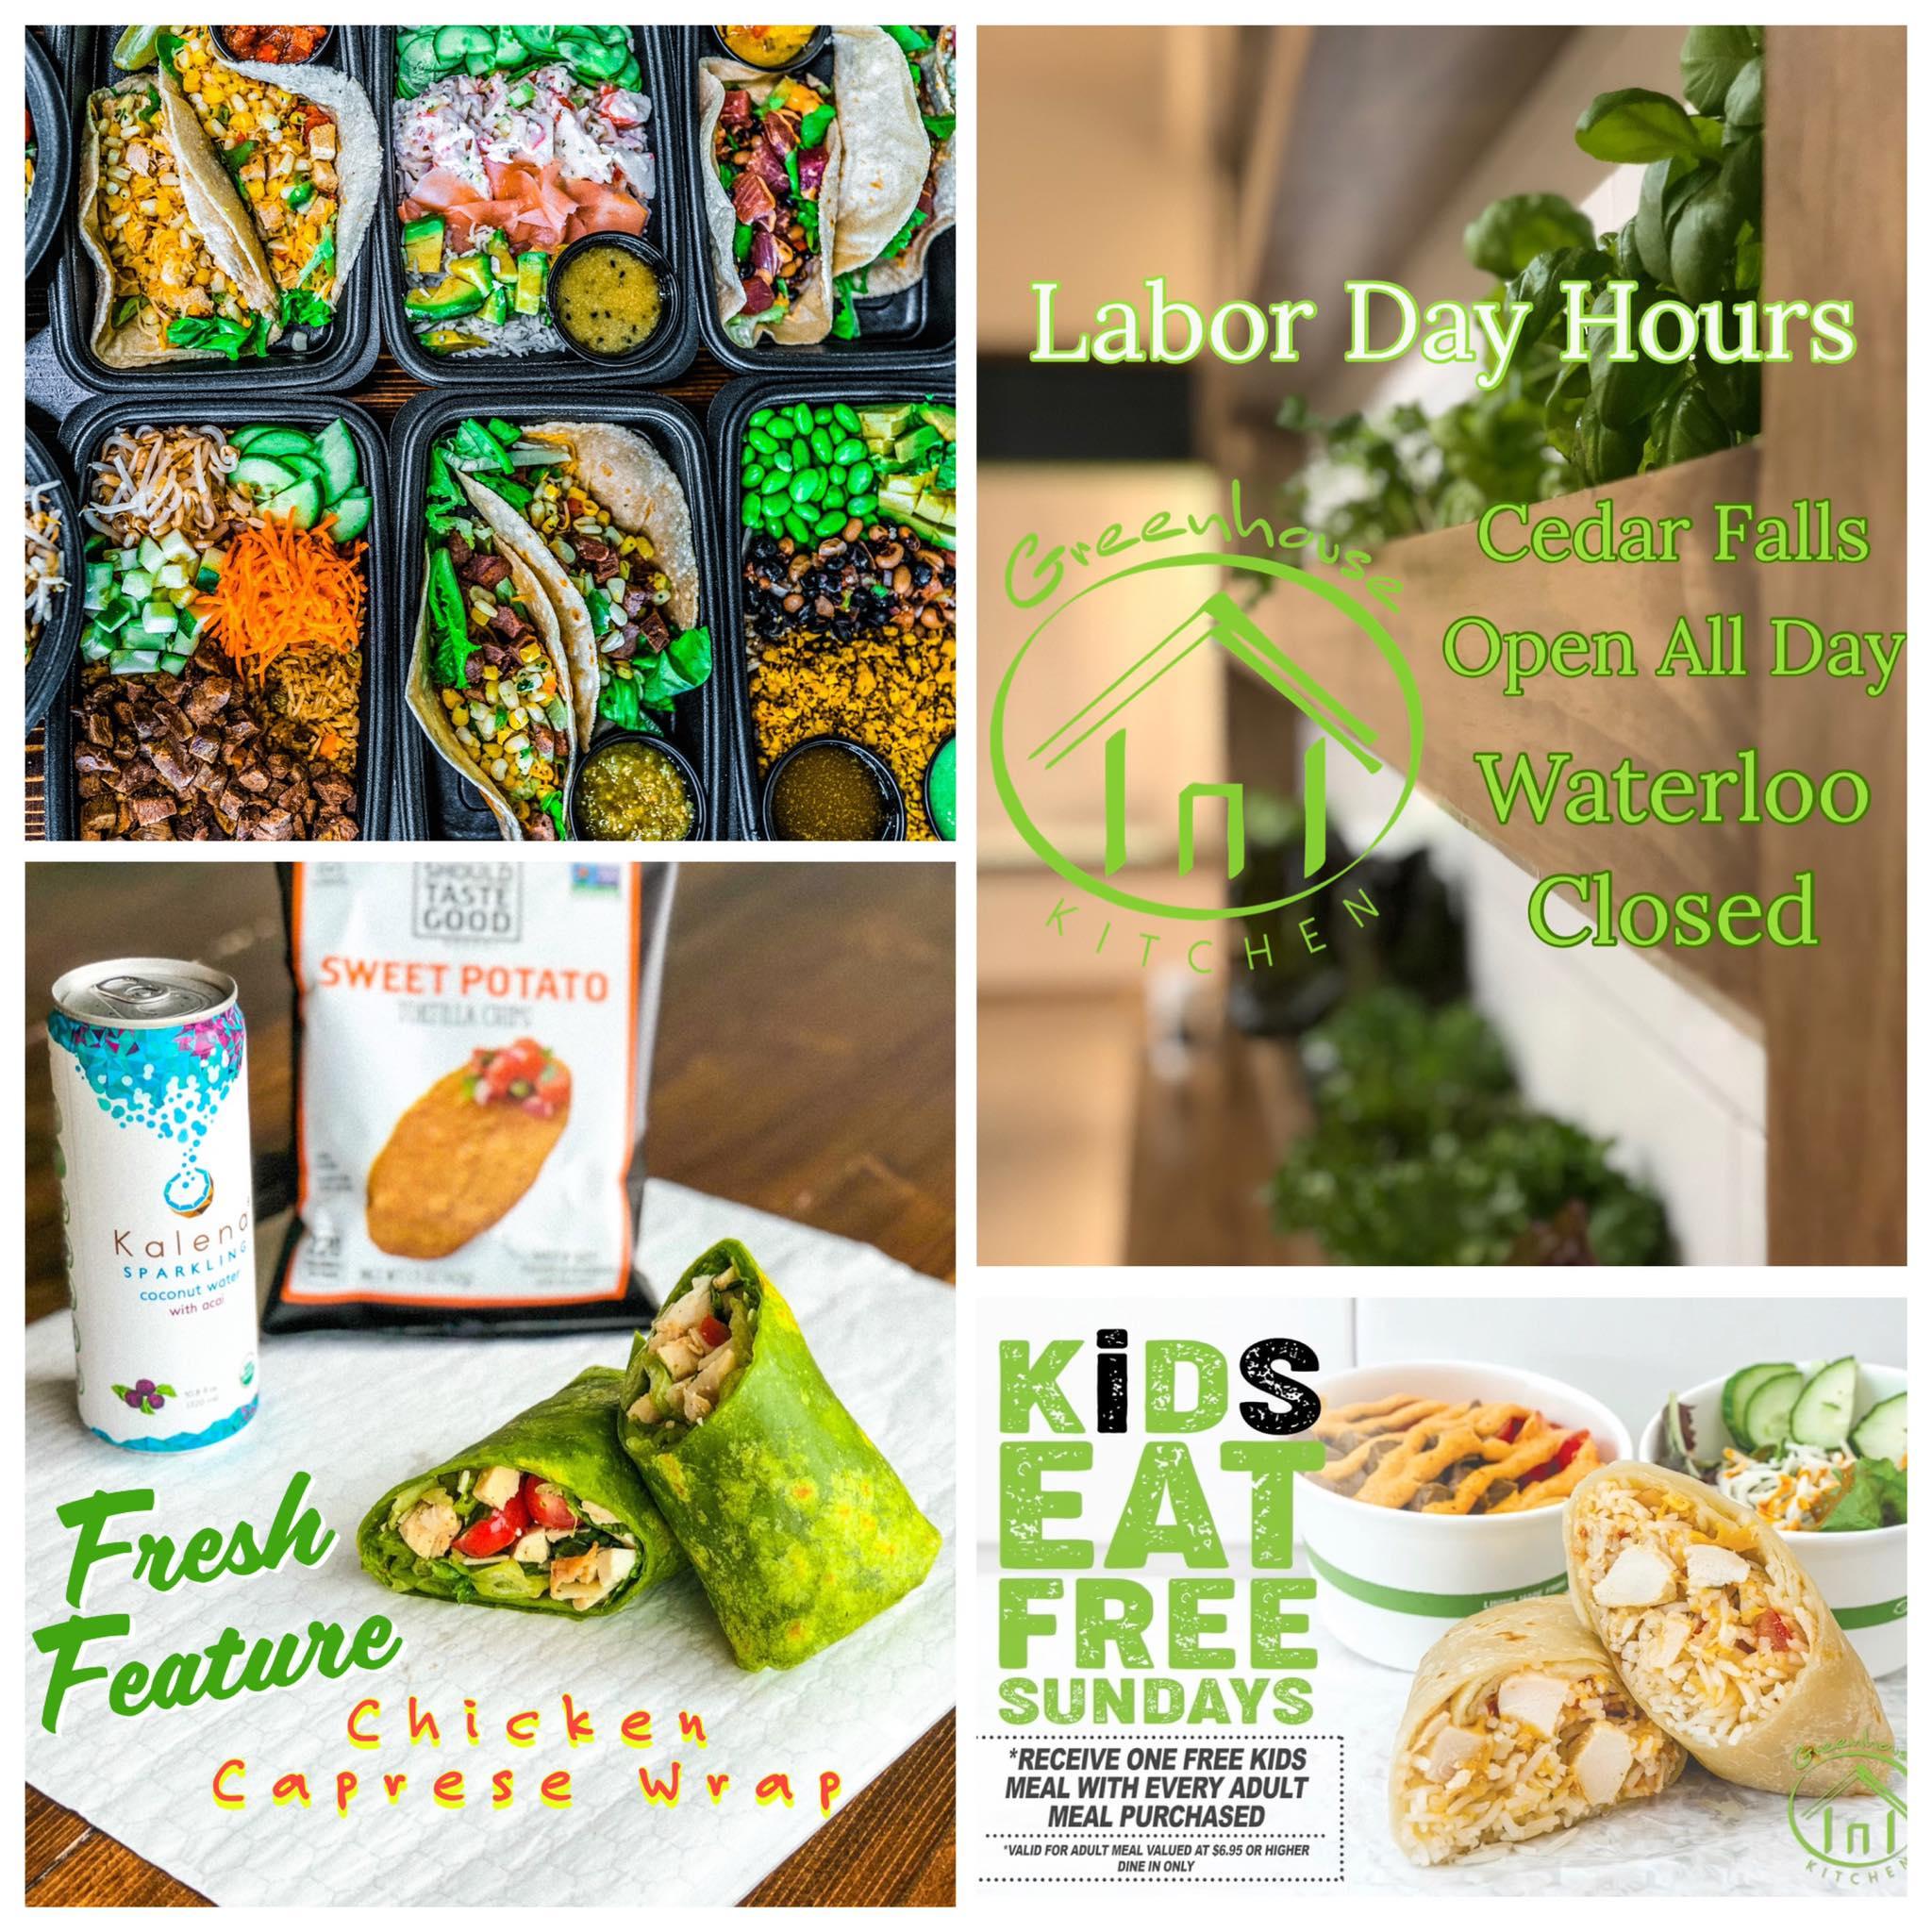 Best Restaurants in Cedar Falls, IA